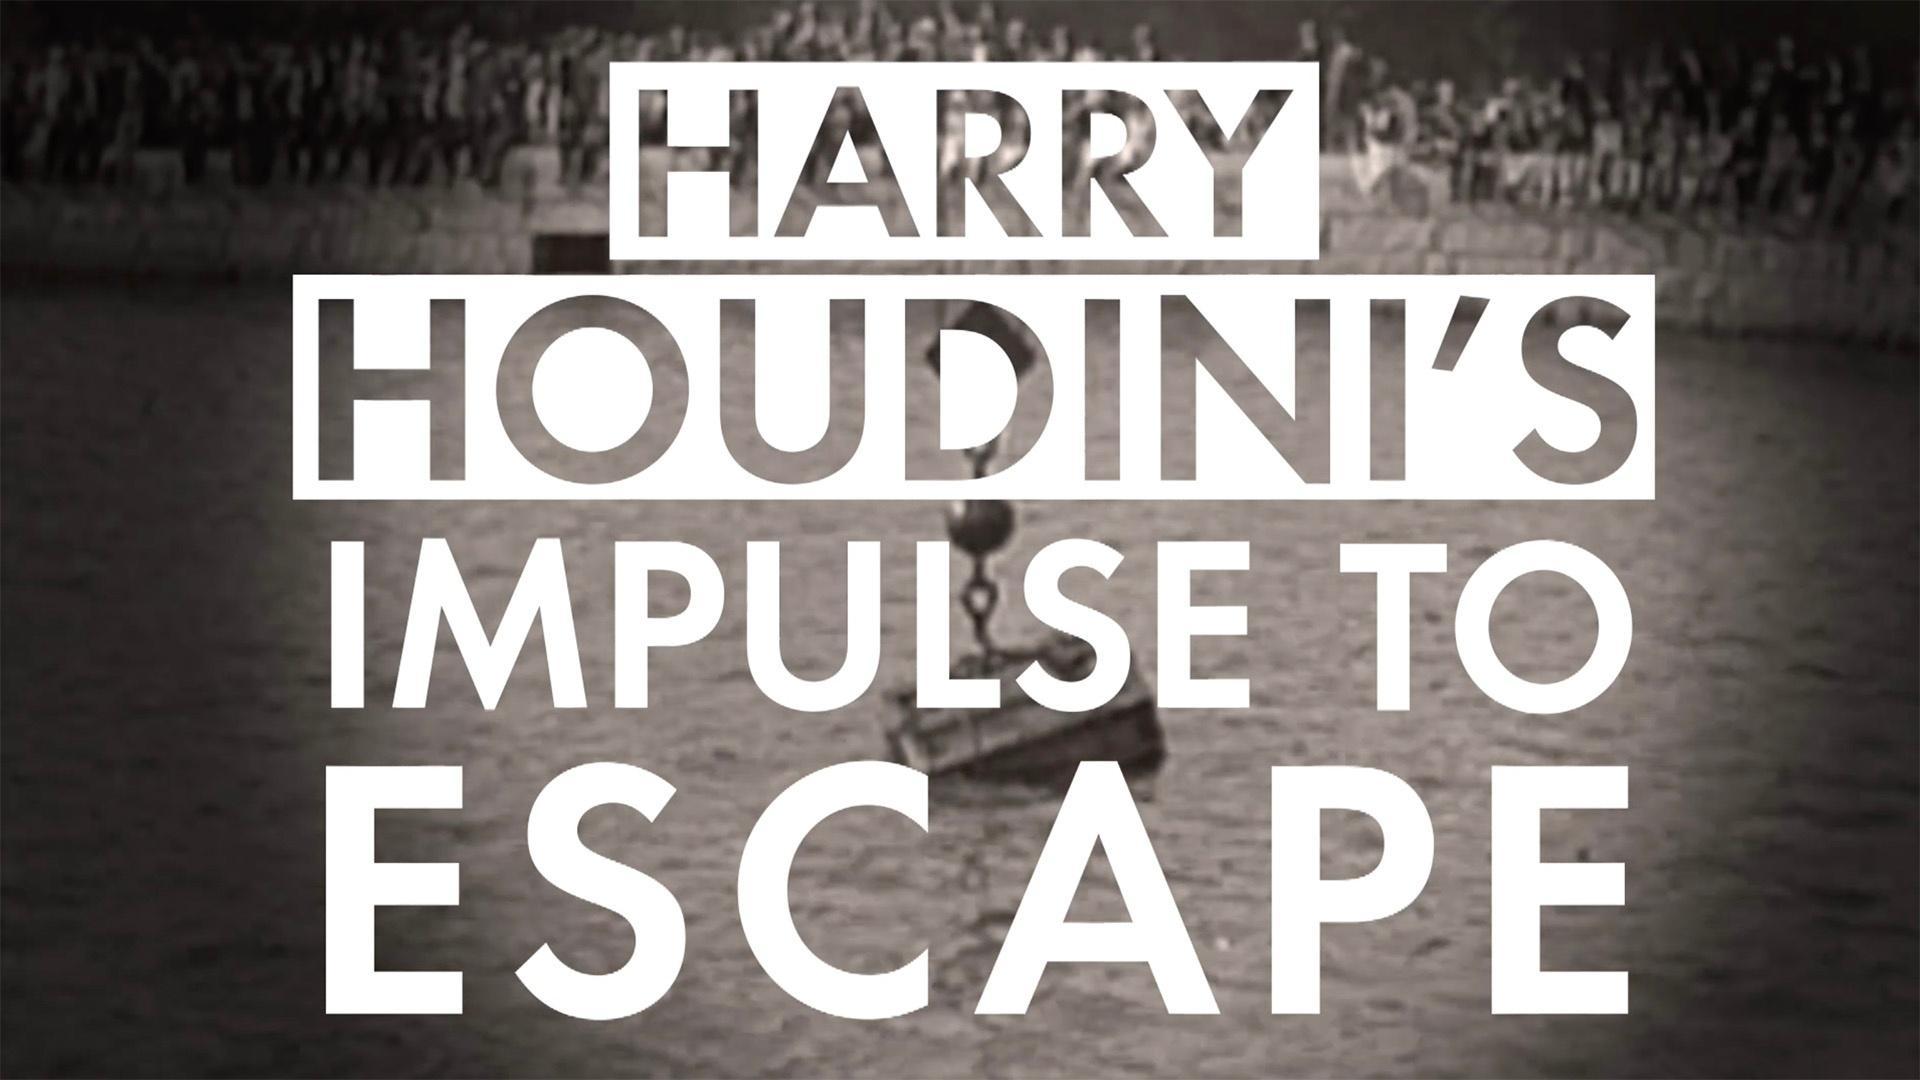 Harry Houdini's Impulse to Escape